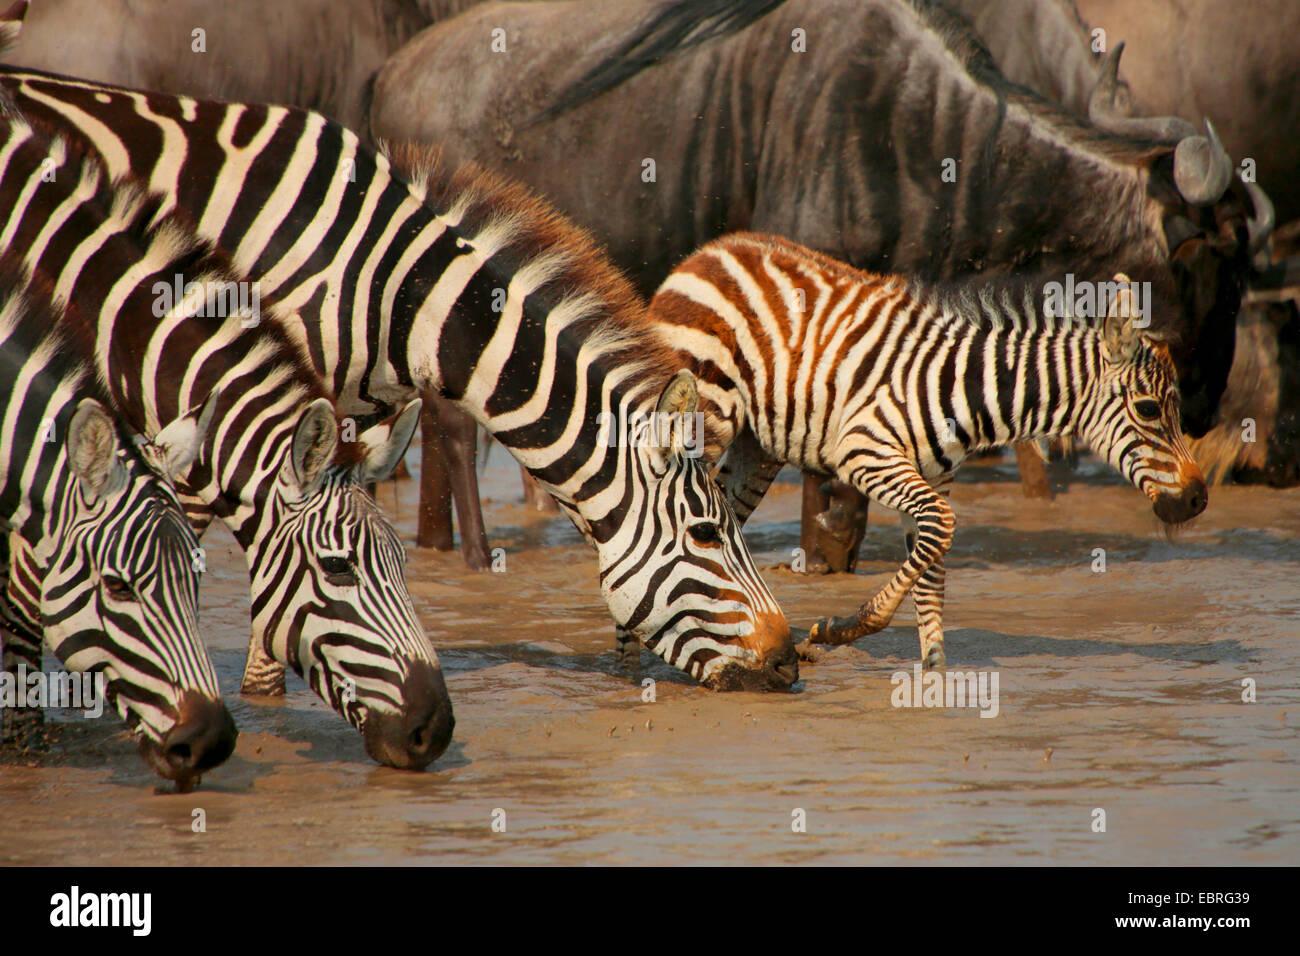 Common Zebra (Equus quagga), zebras drink at a waterhole, Tanzania, Serengeti National Park - Stock Image